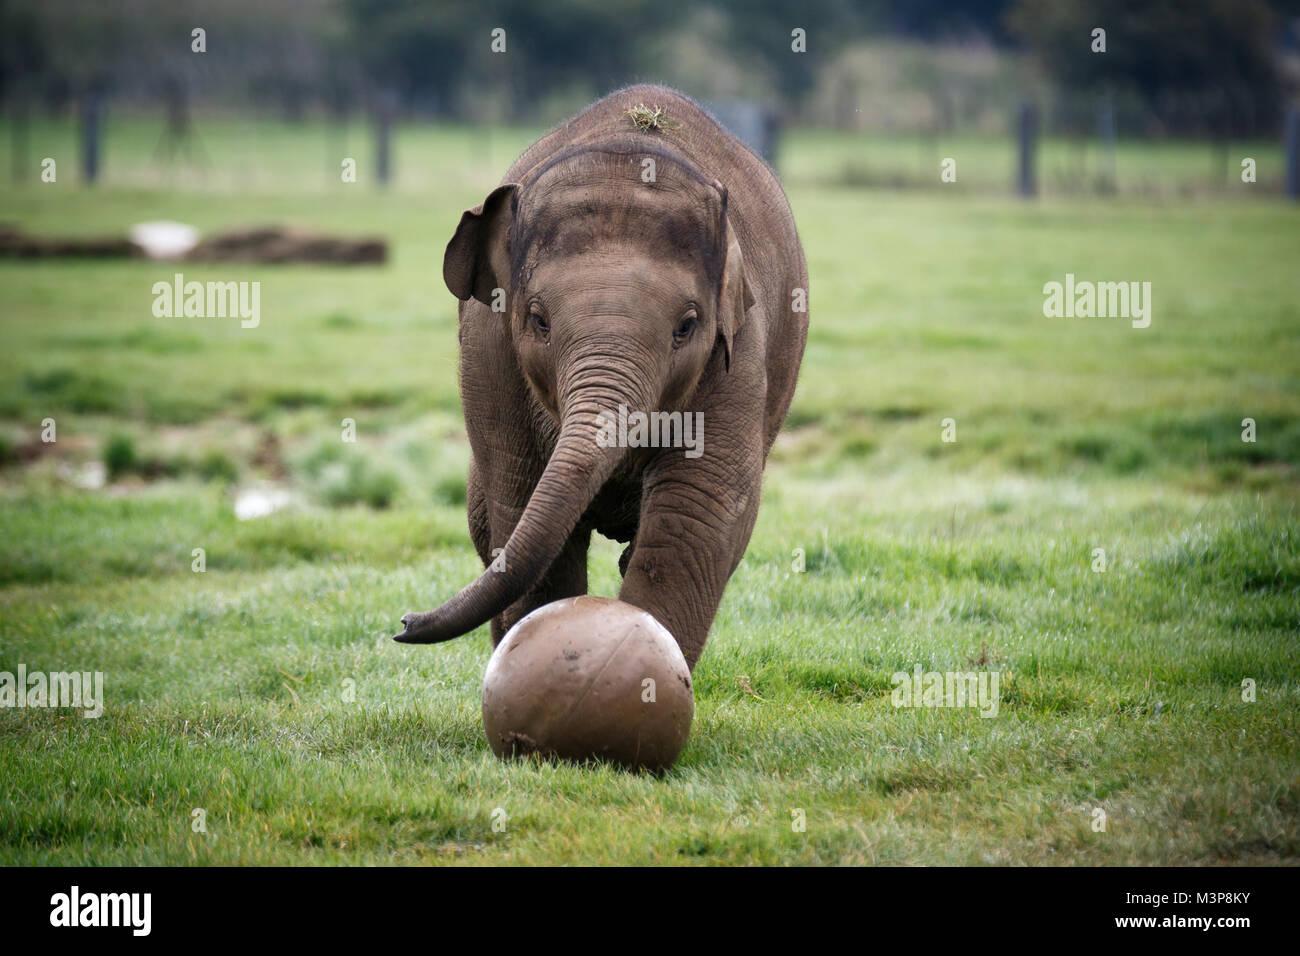 Elefante asiático en el ZSL Whipsnade Zoo Imagen De Stock